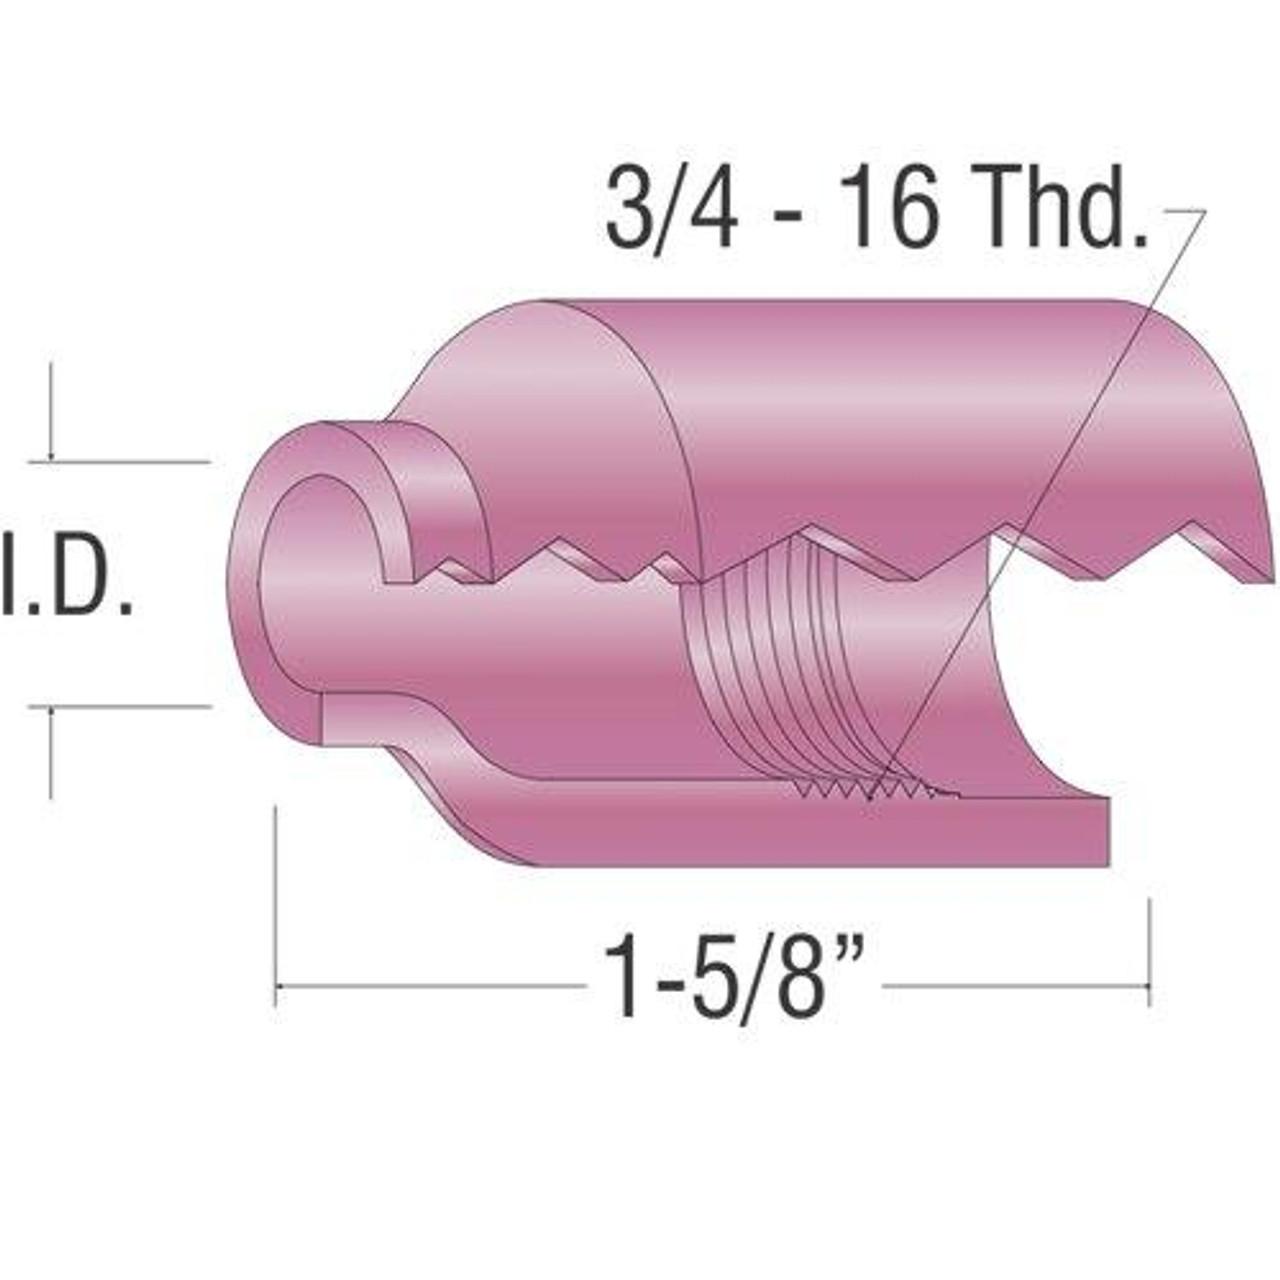 Profax 54N15 Alumina Cup 7/16 17-18-26 Series TIG Torch - 10 Pack